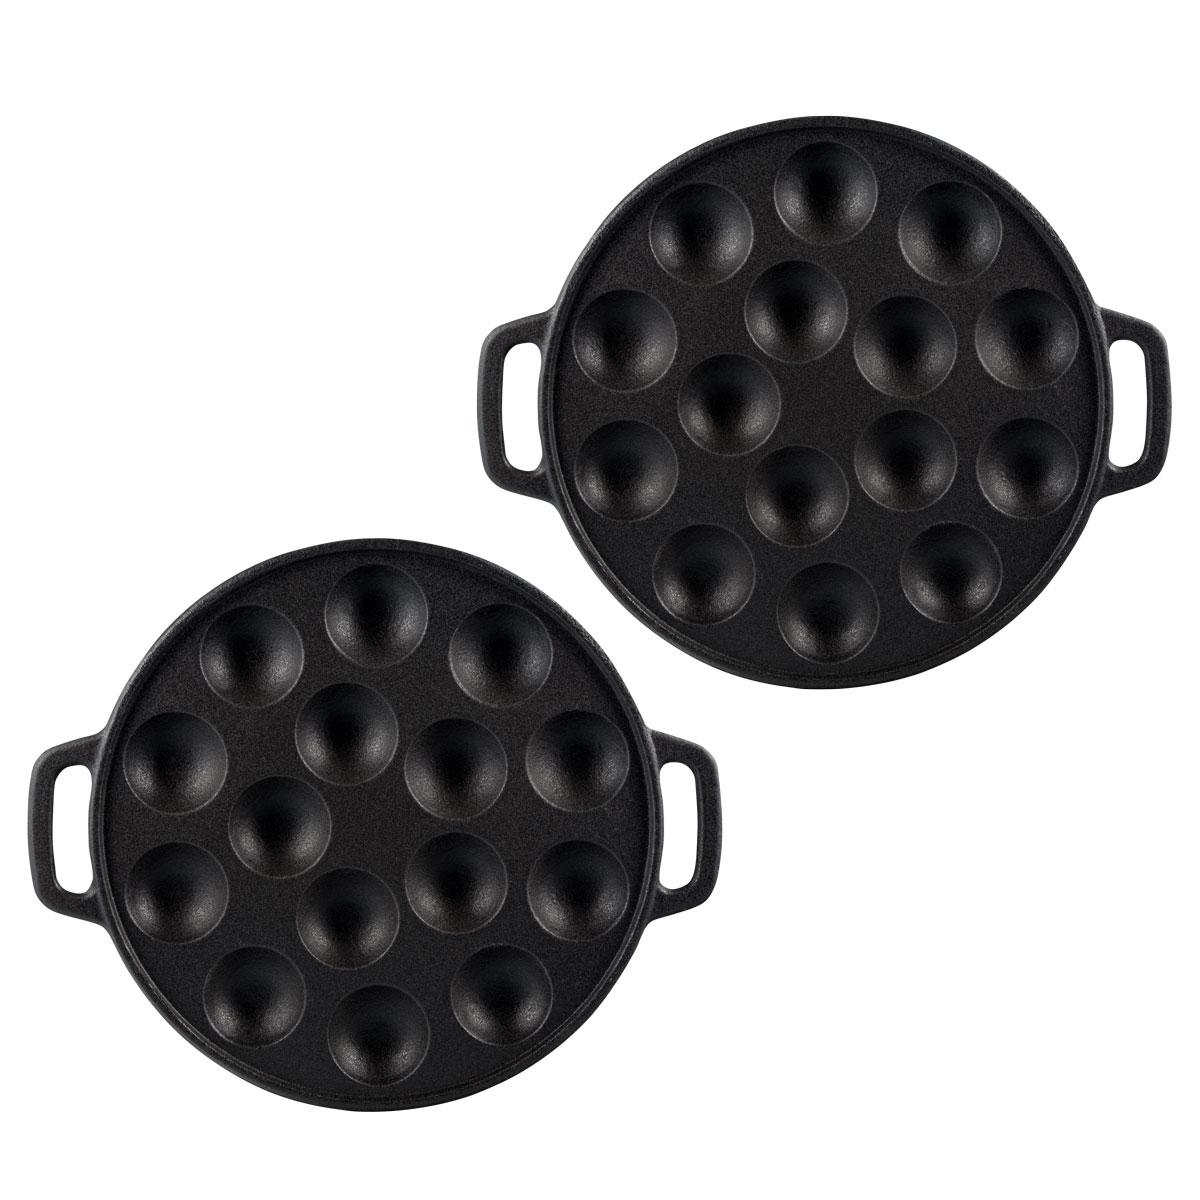 2 poffertjes pfannen gusseisen poffertjes pan platte mini pfannkuchen bratpfanne ebay. Black Bedroom Furniture Sets. Home Design Ideas